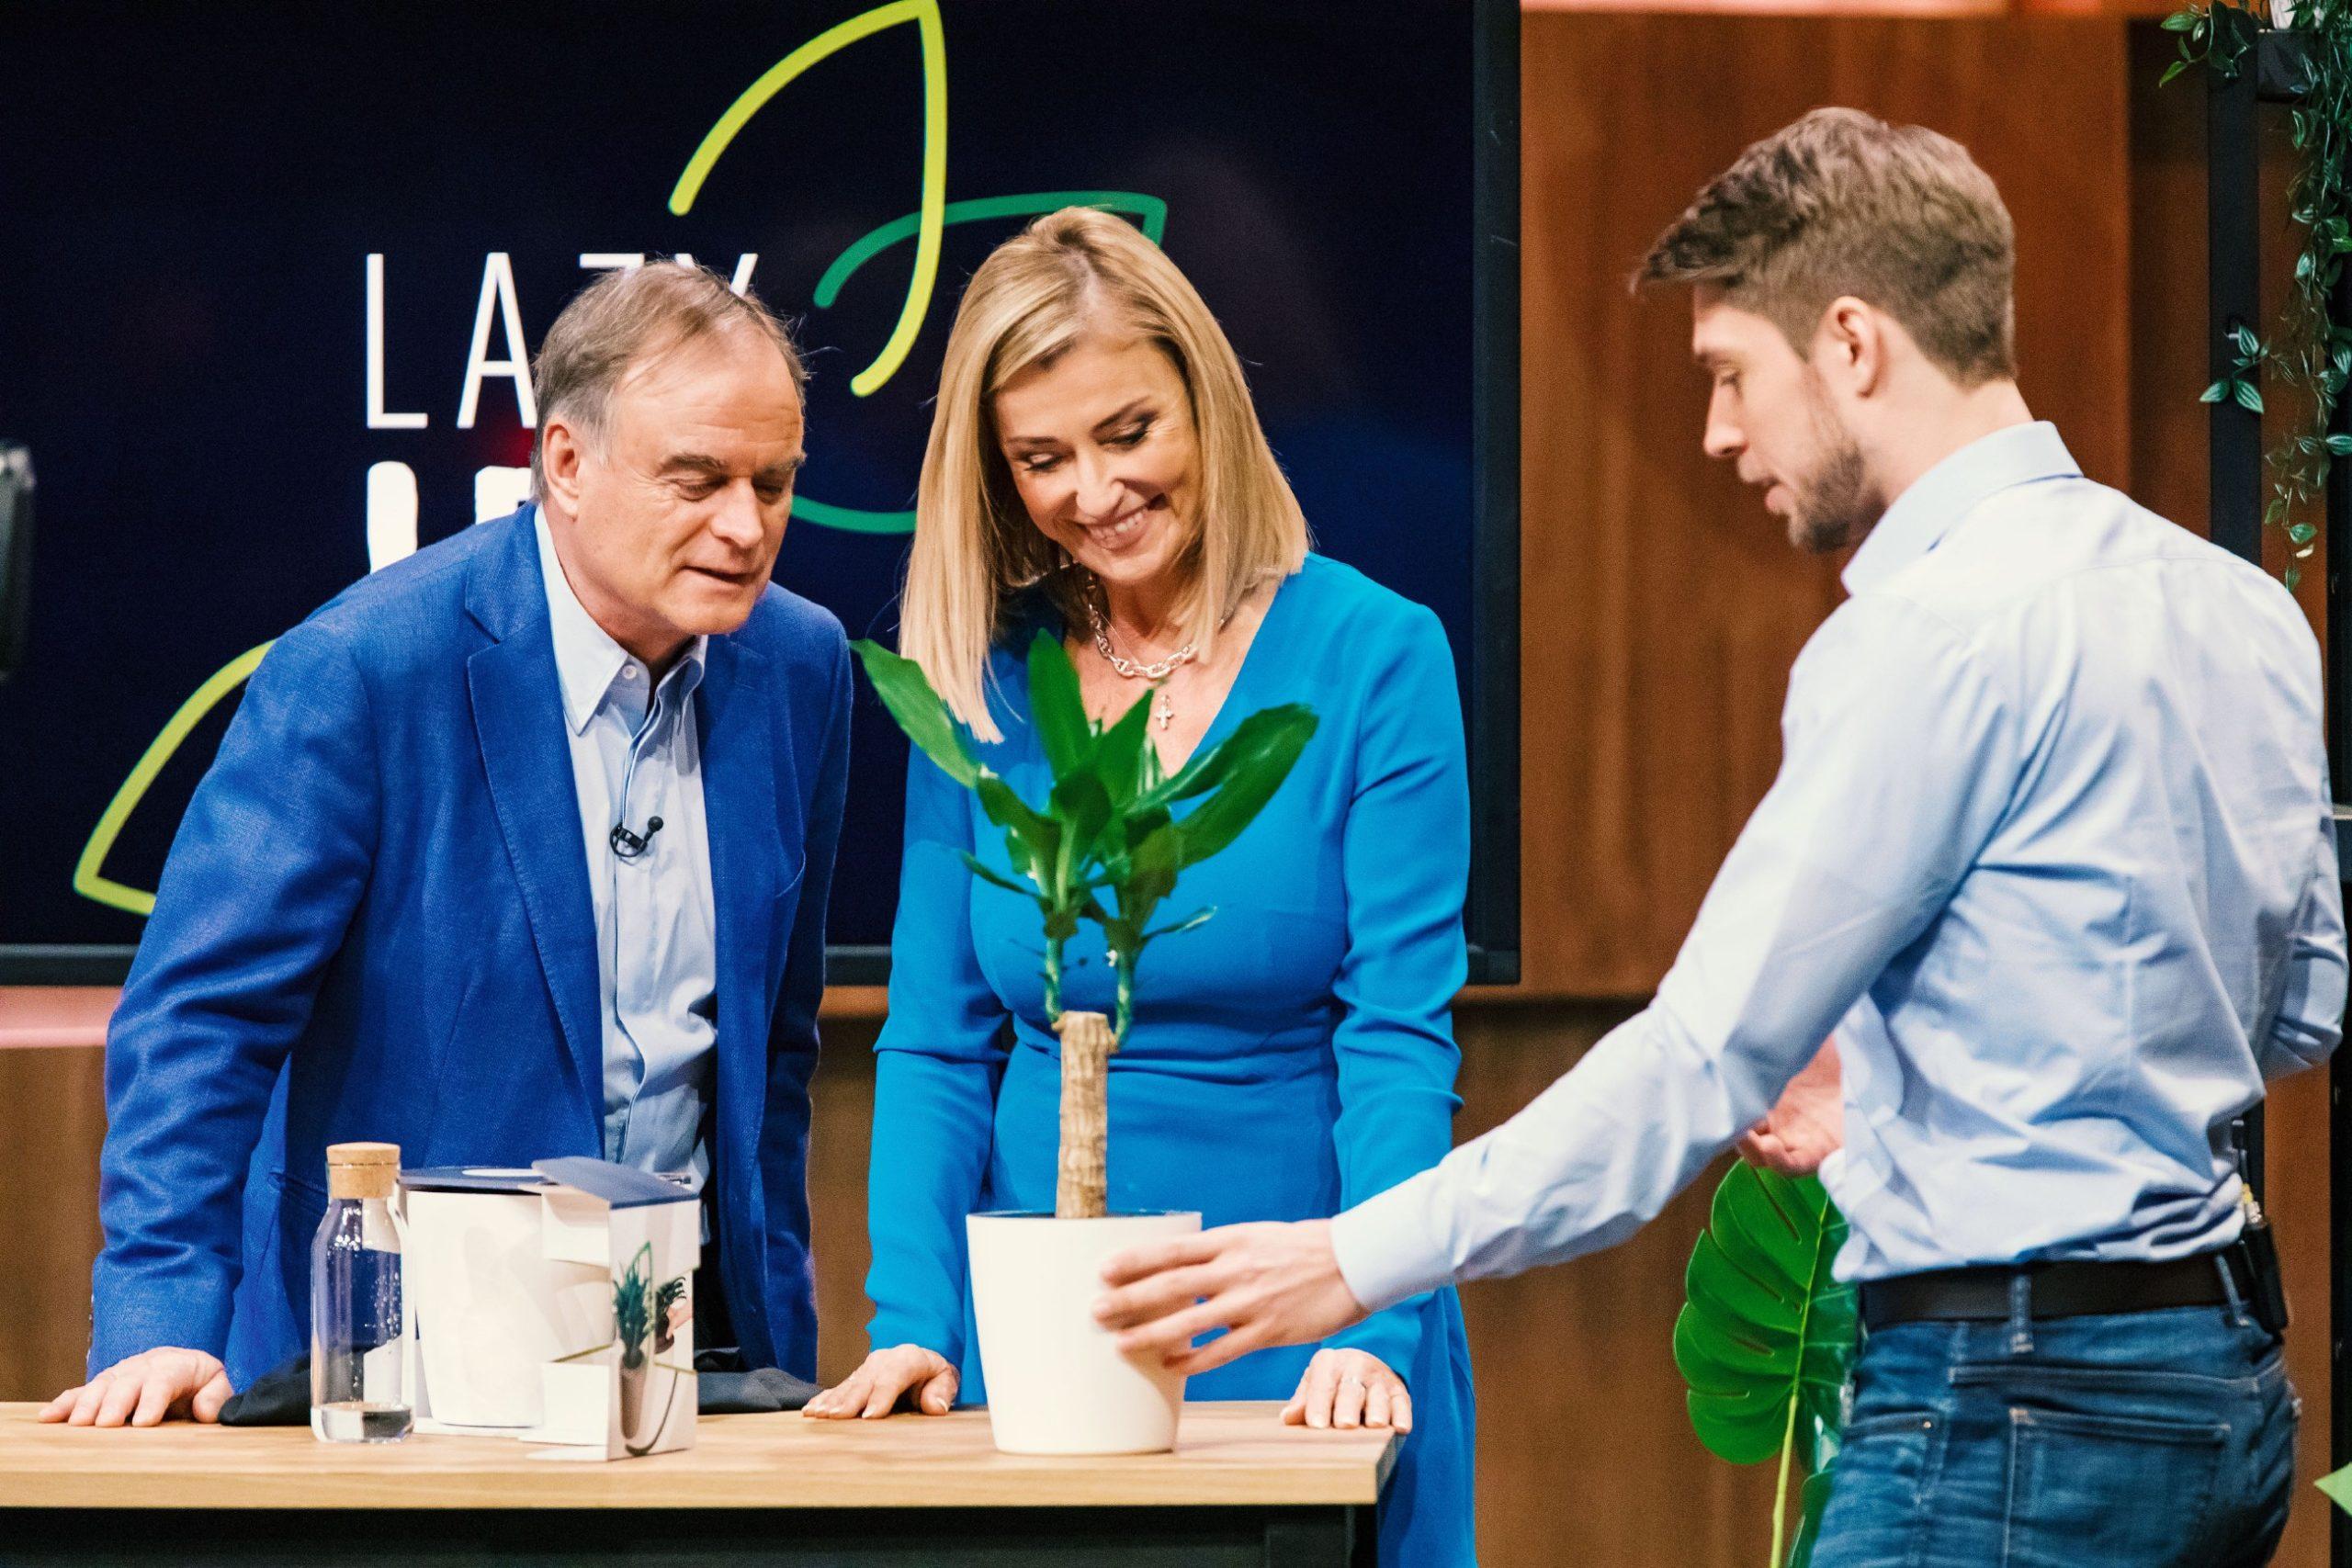 Lazy Leaf, Höhle der Löwen, Frank Thelen, Dagmar Wöhrl, Carsten Maschmeyer, Georg Kofler, Ralf Dümmel, Startup